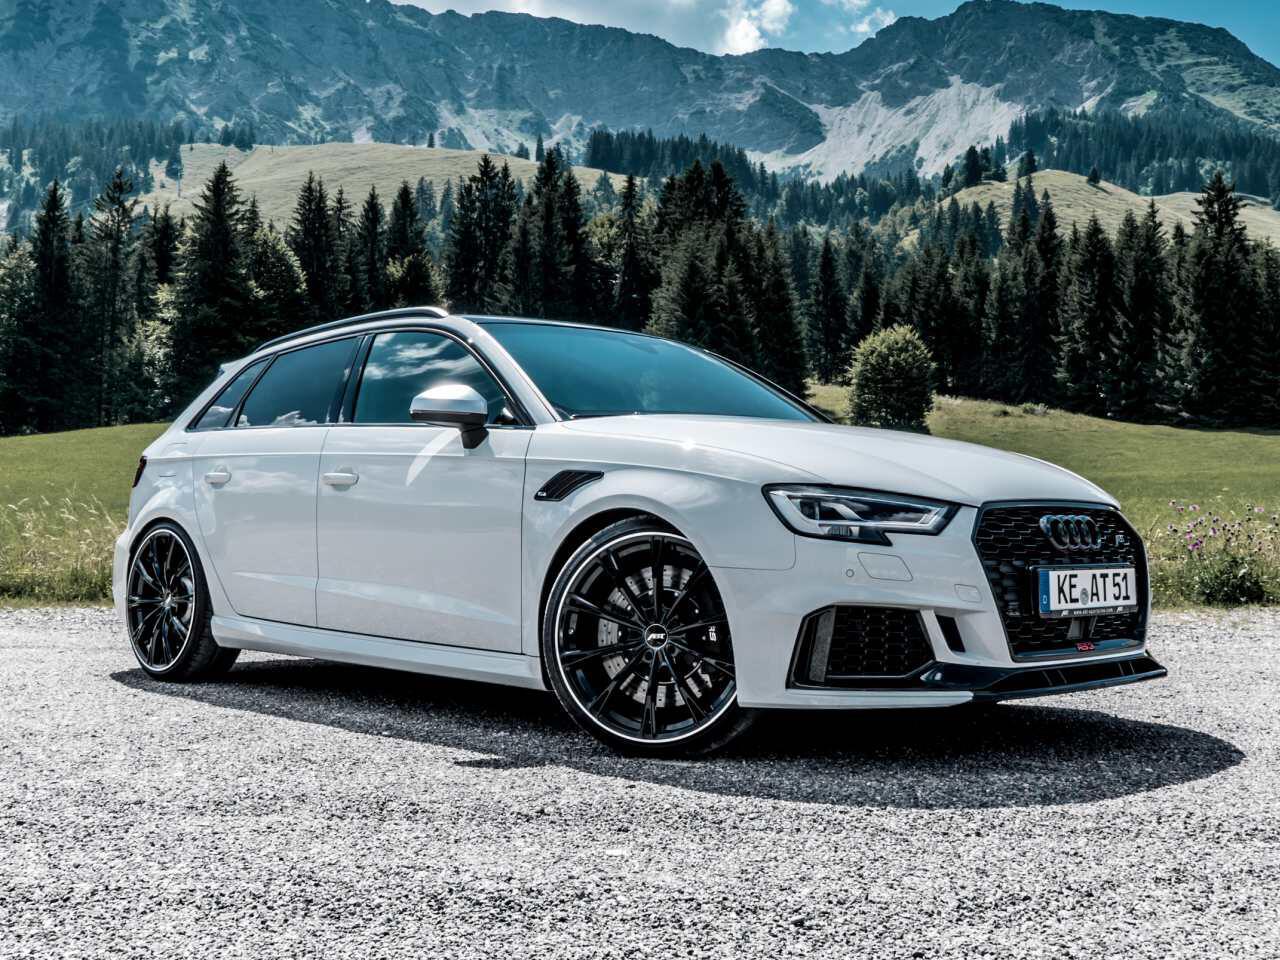 Bild zu Abt Audi RS3 Sportback Edelweiß